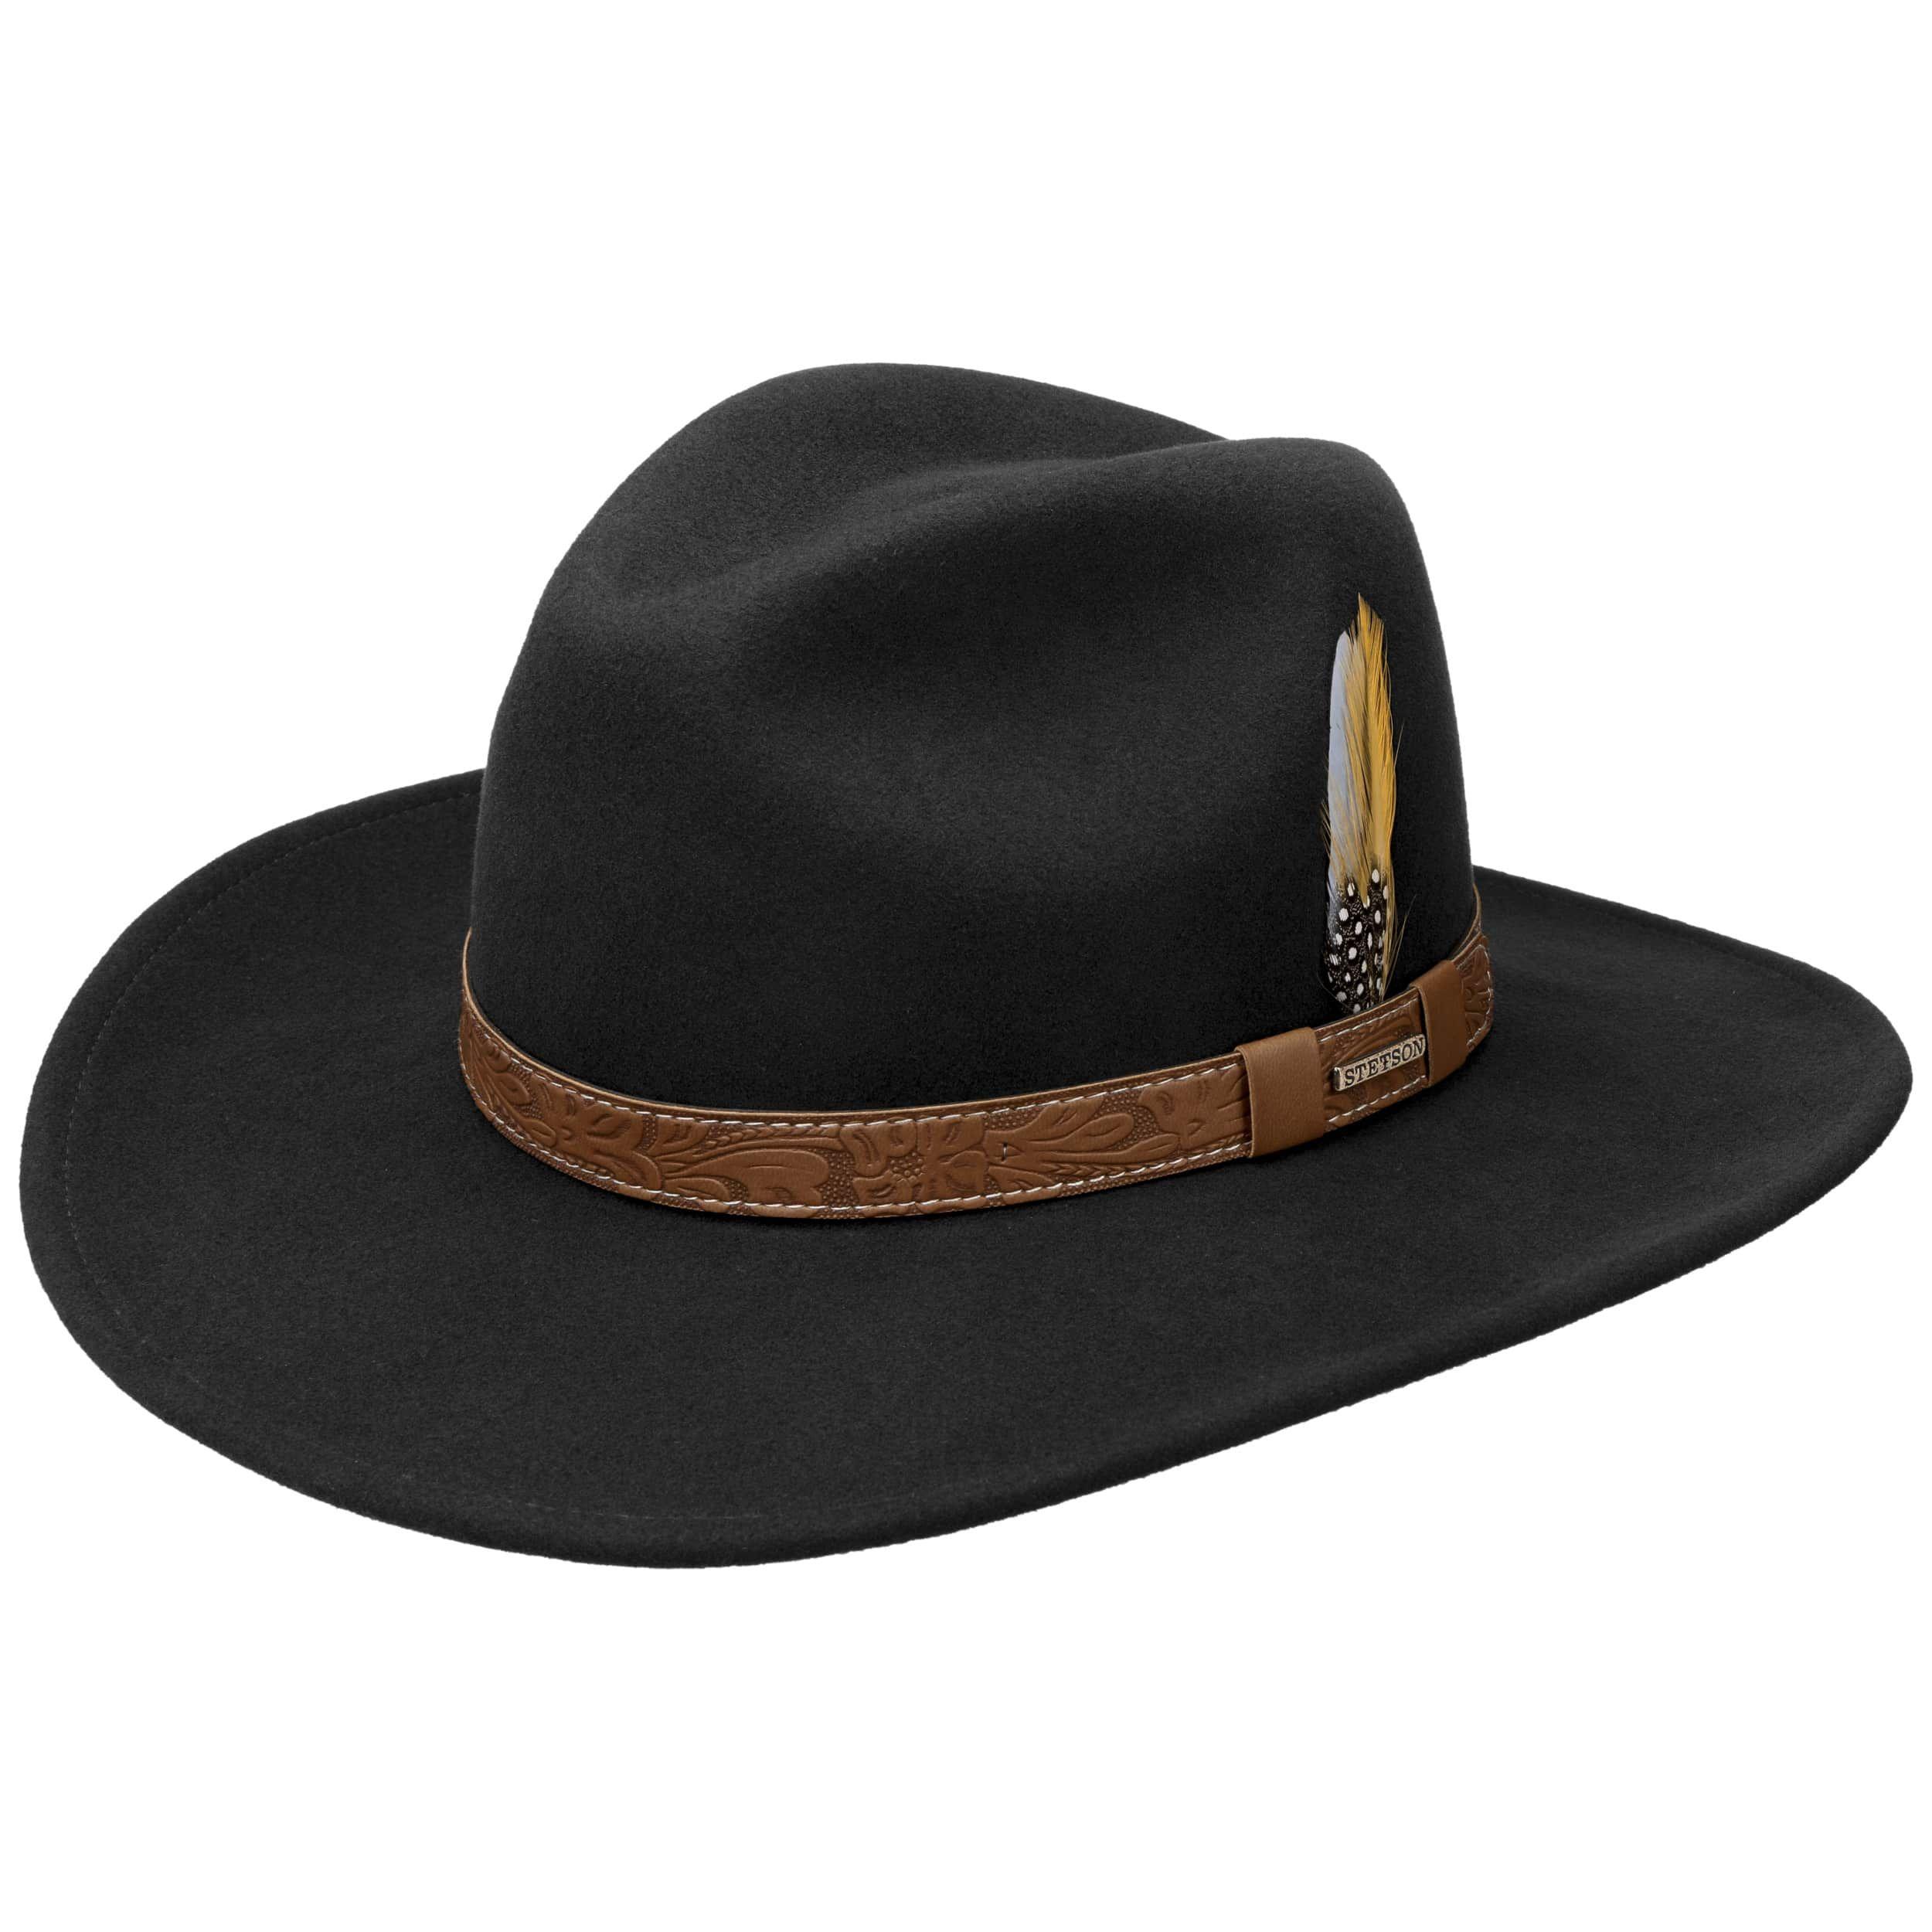 Wide Brim VitaFelt Cowboy Hat black